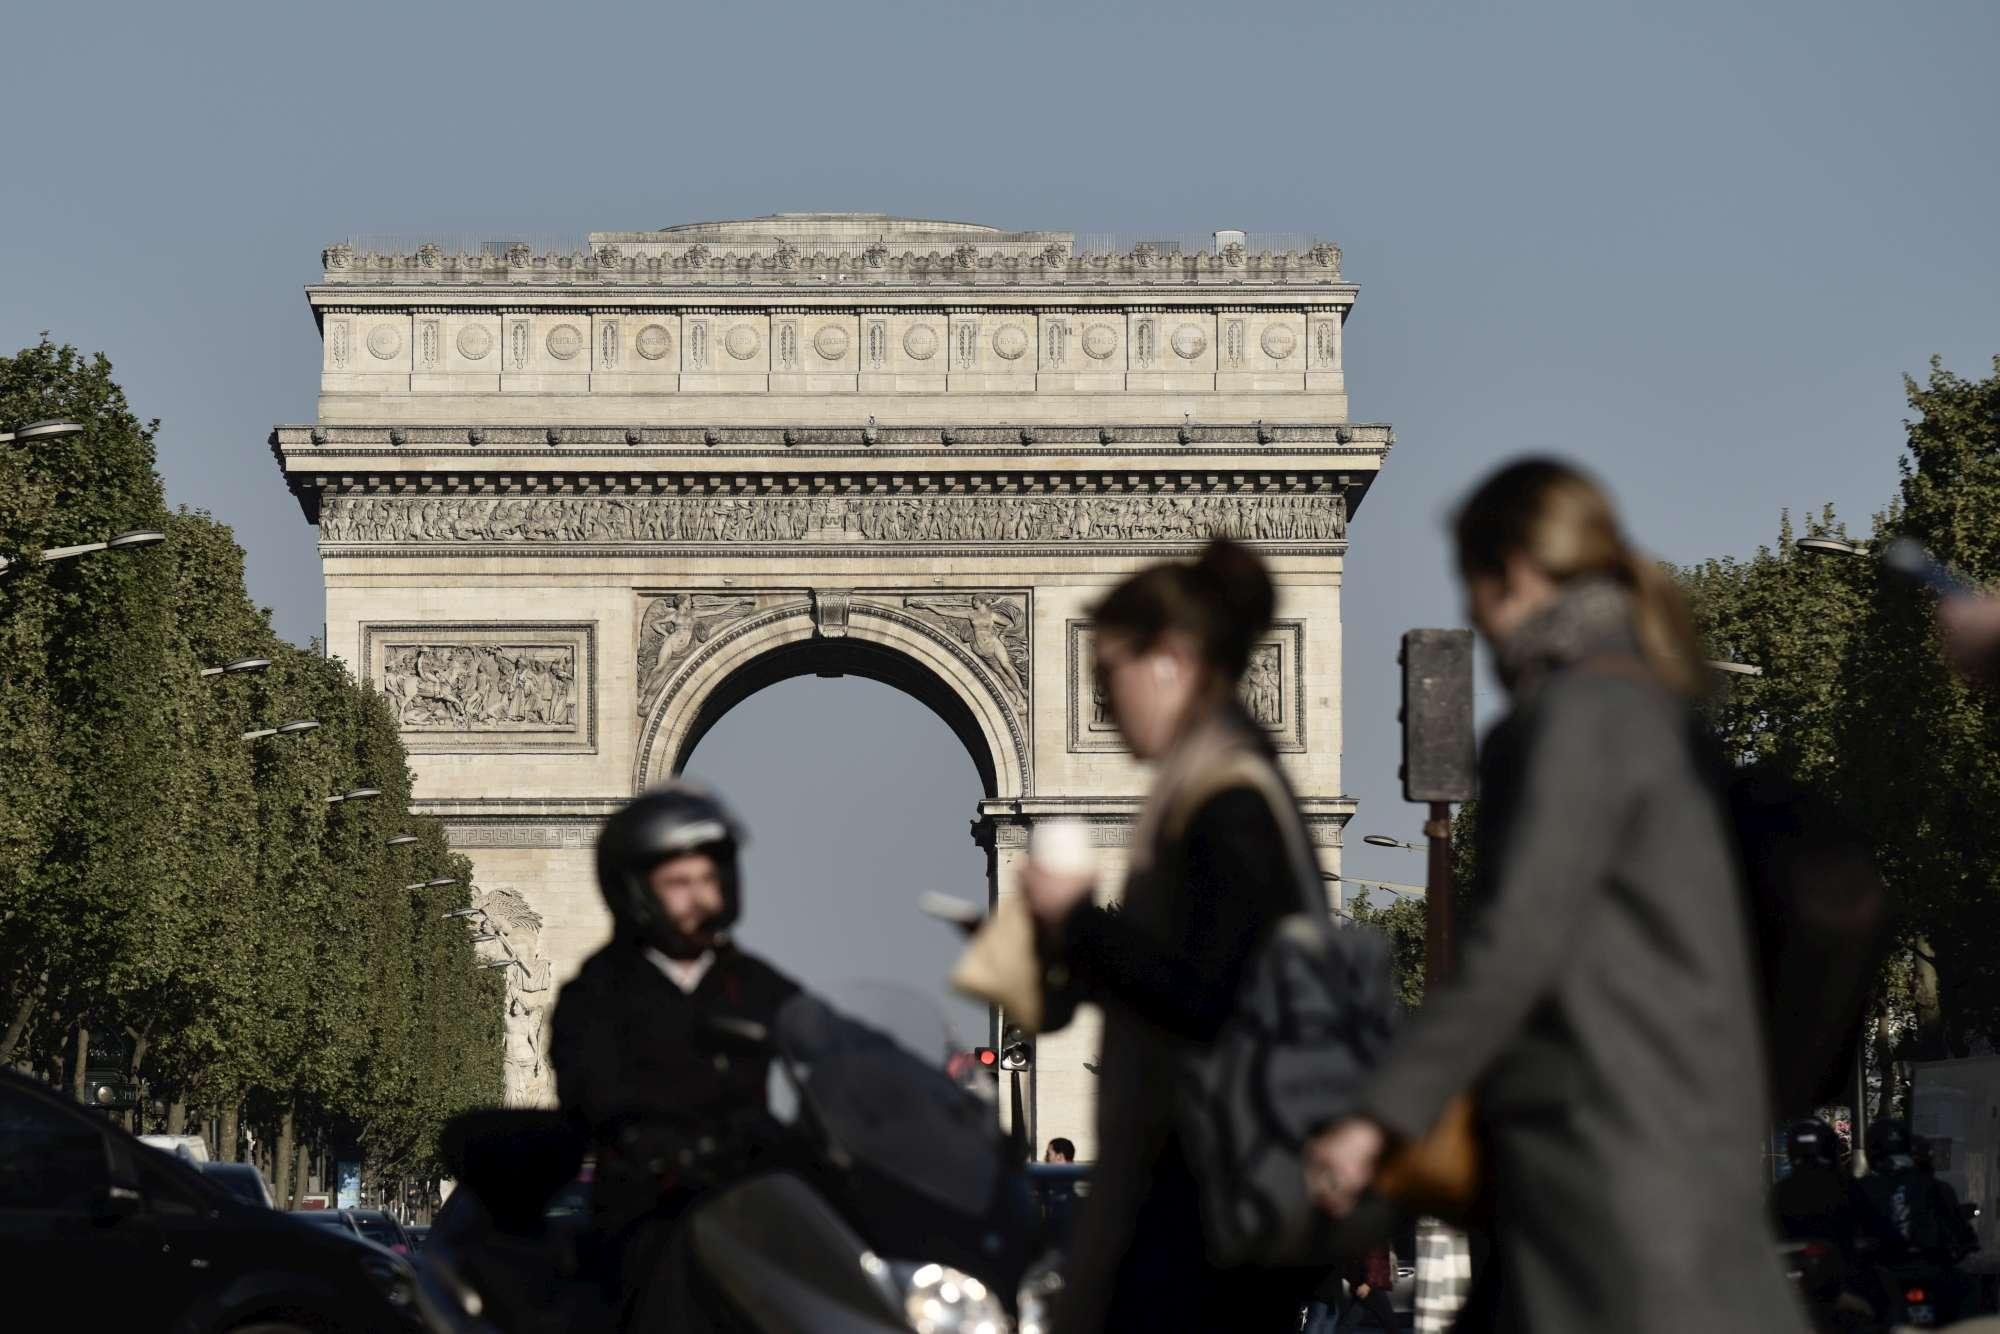 Parigi, dopo l attacco riaperti gli Champs Elysées